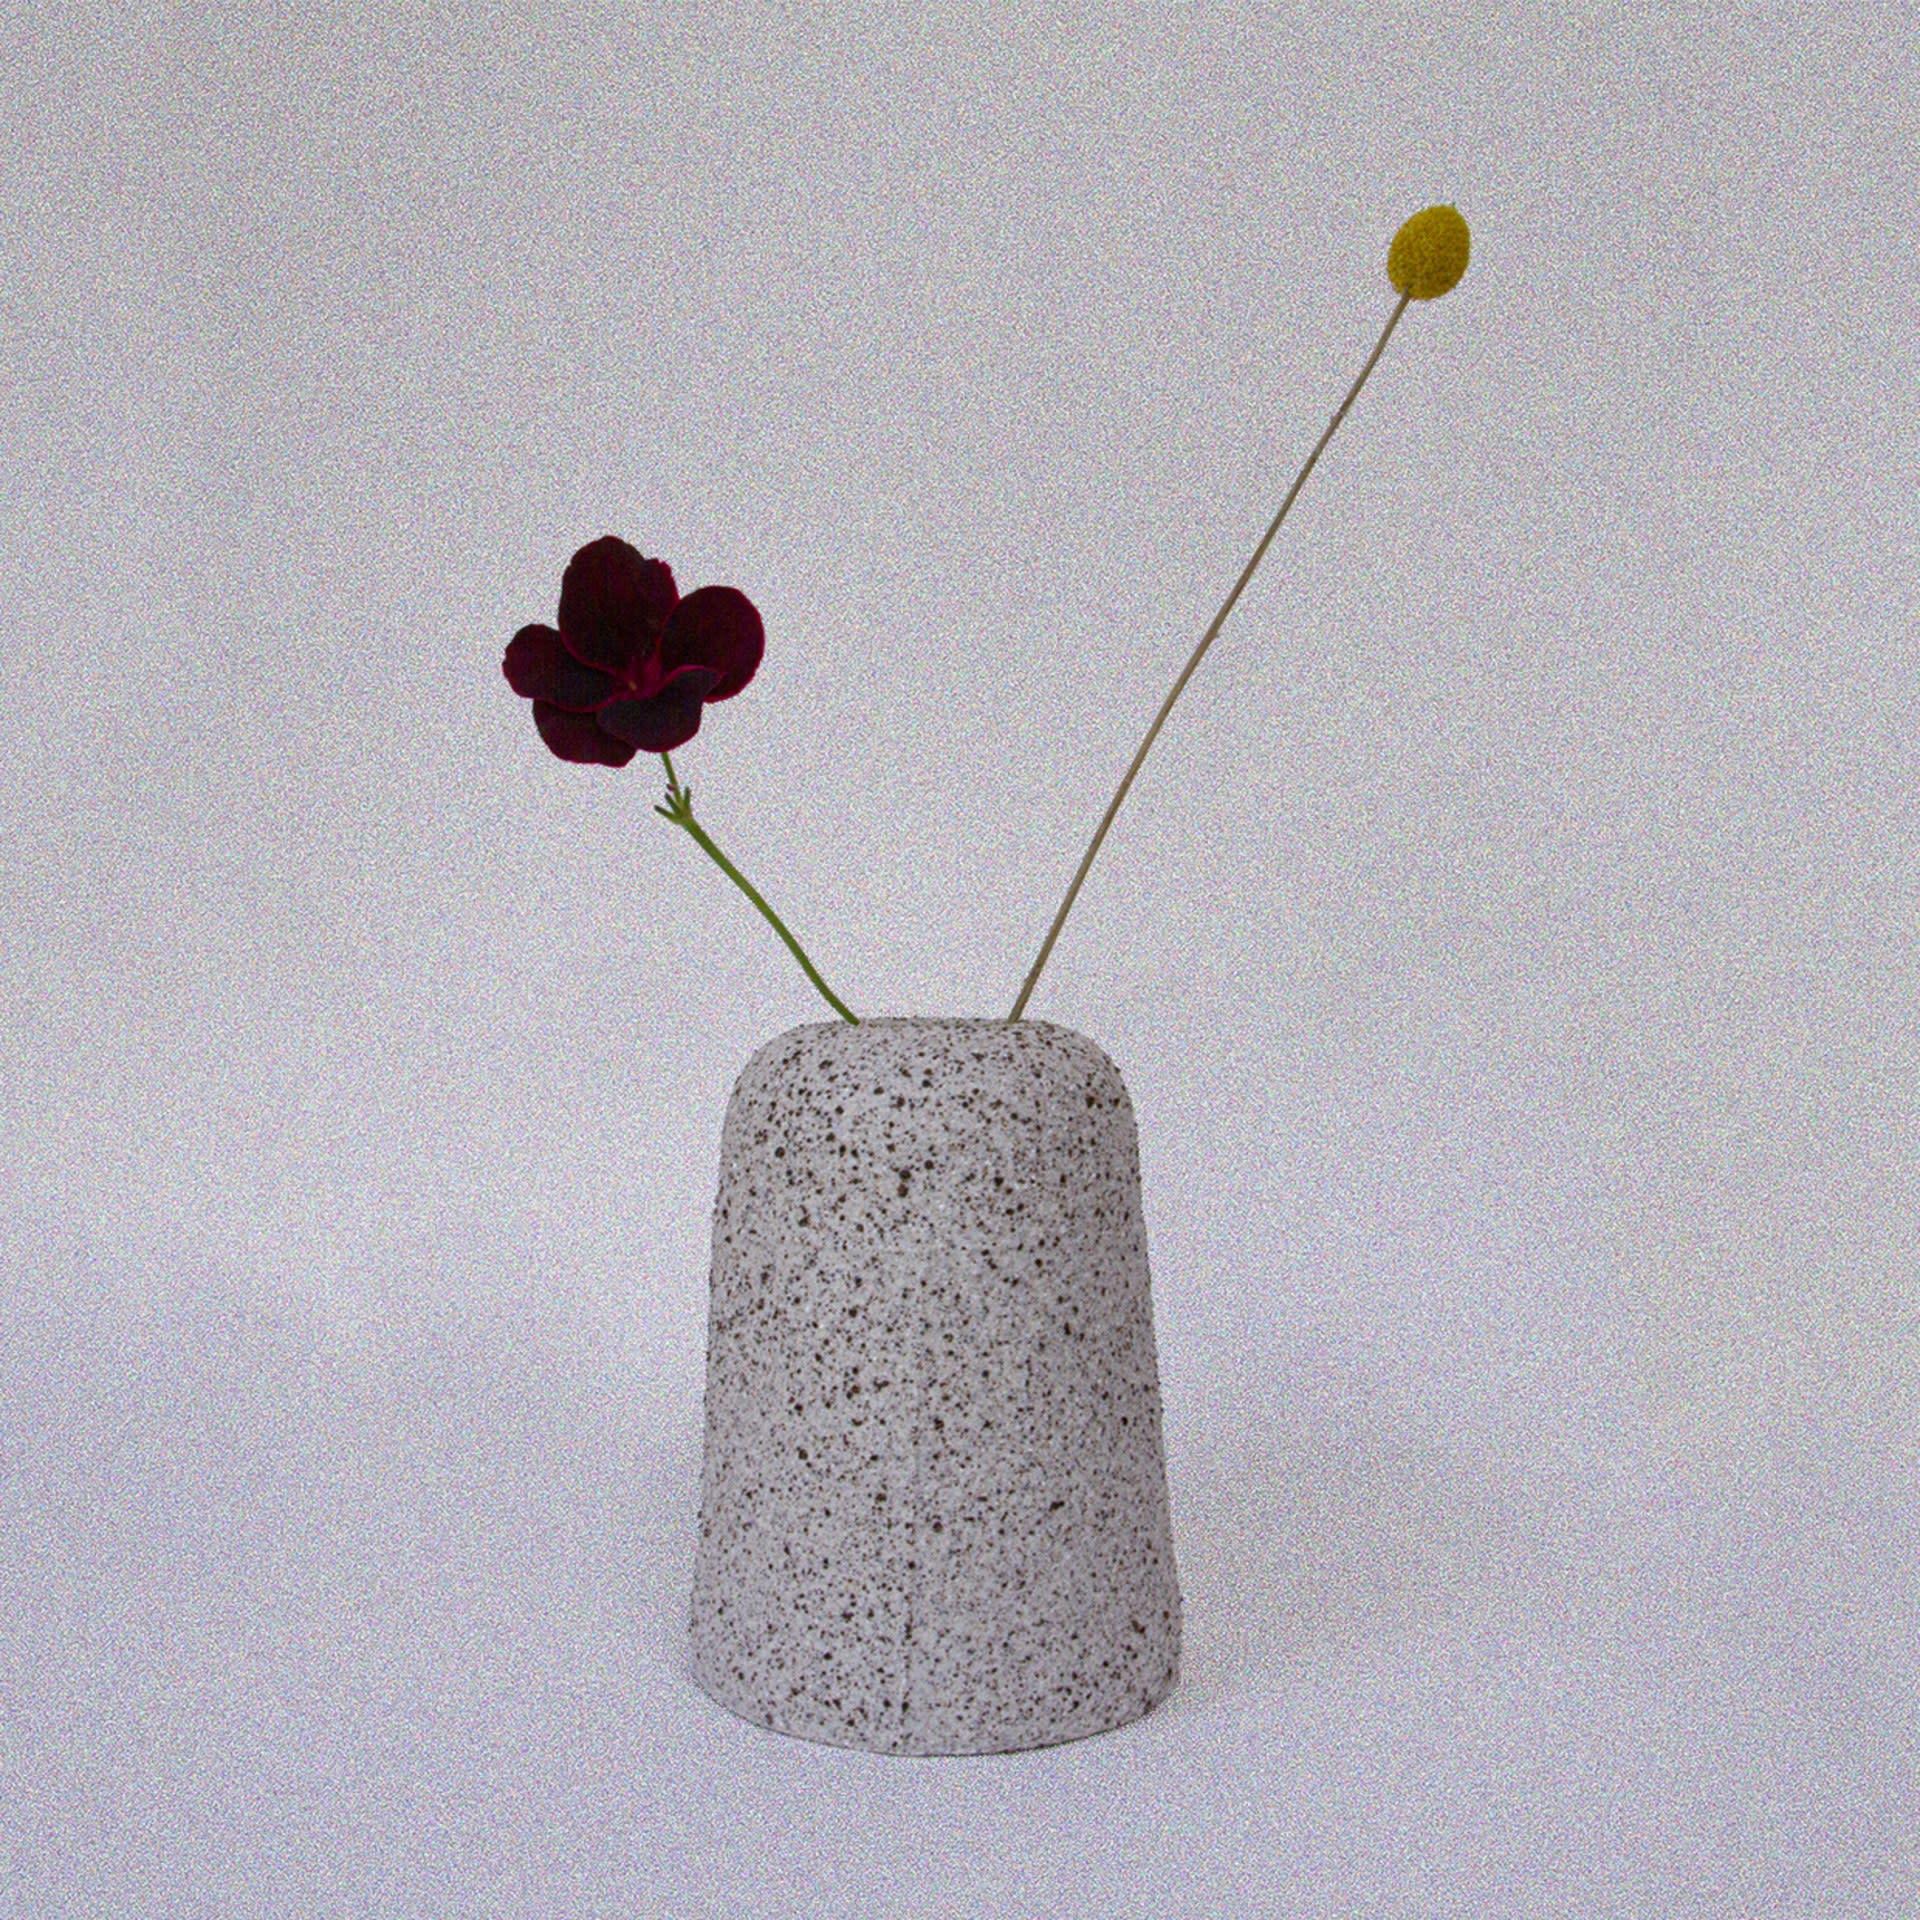 Kotto Vase #4